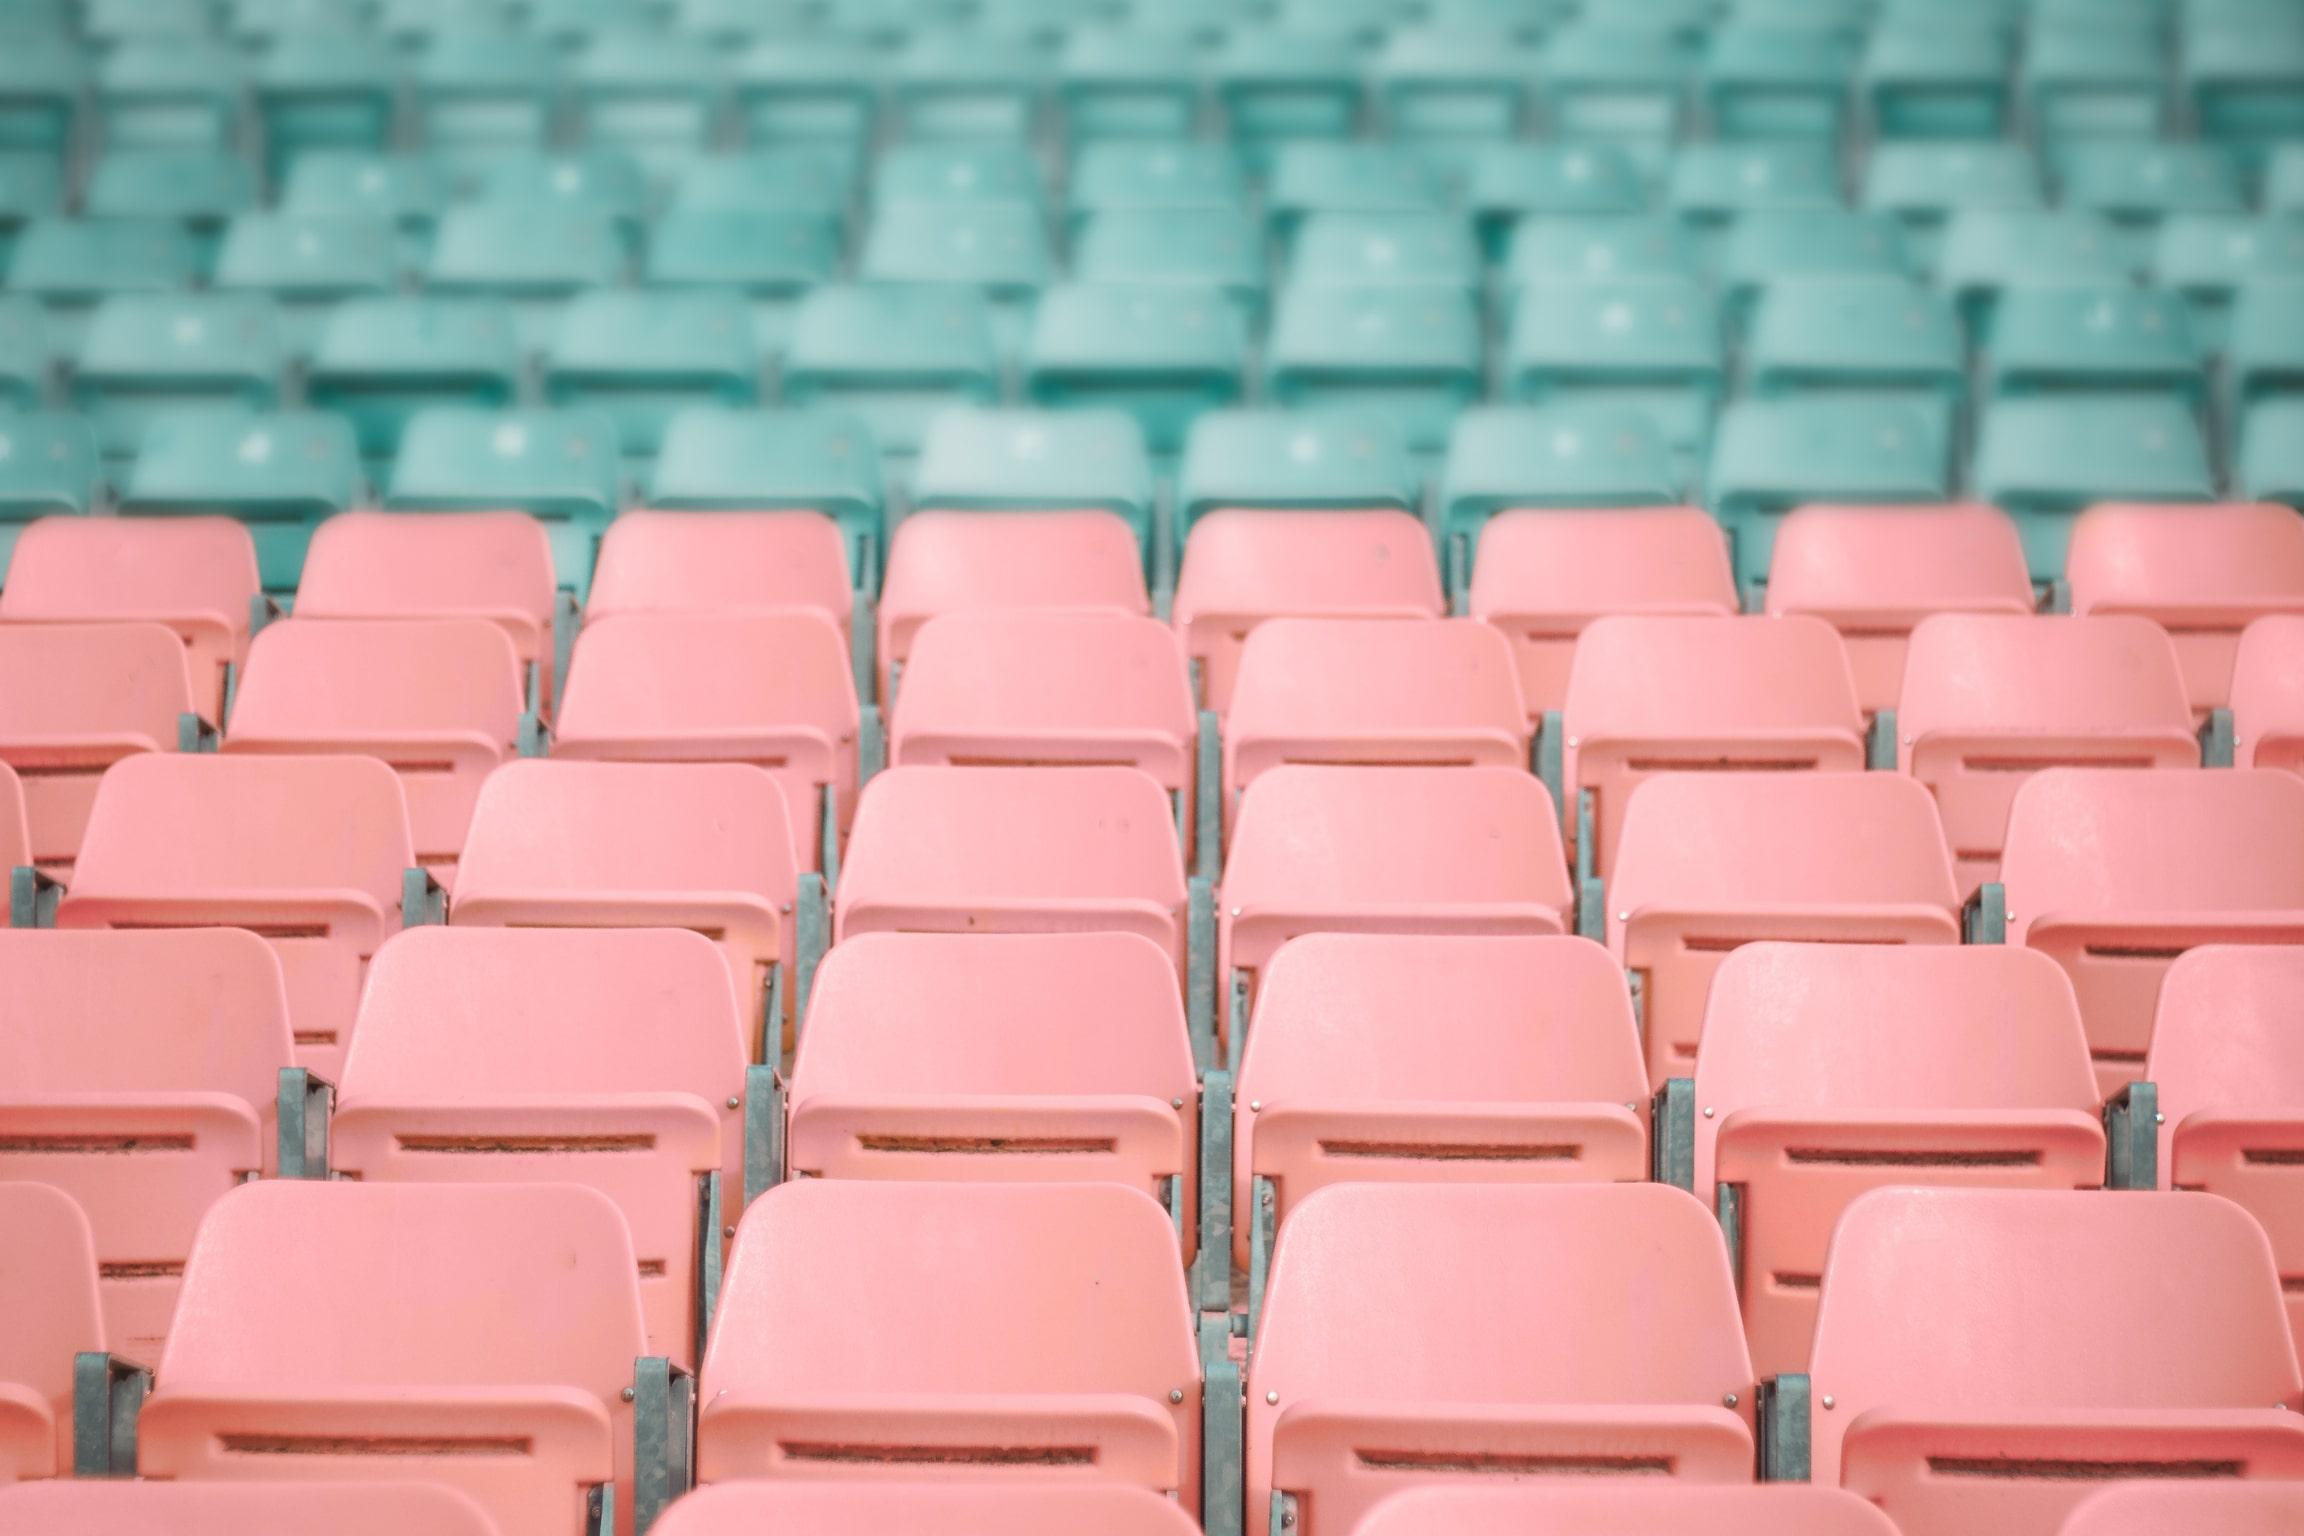 pink and blue stadium plastic seats